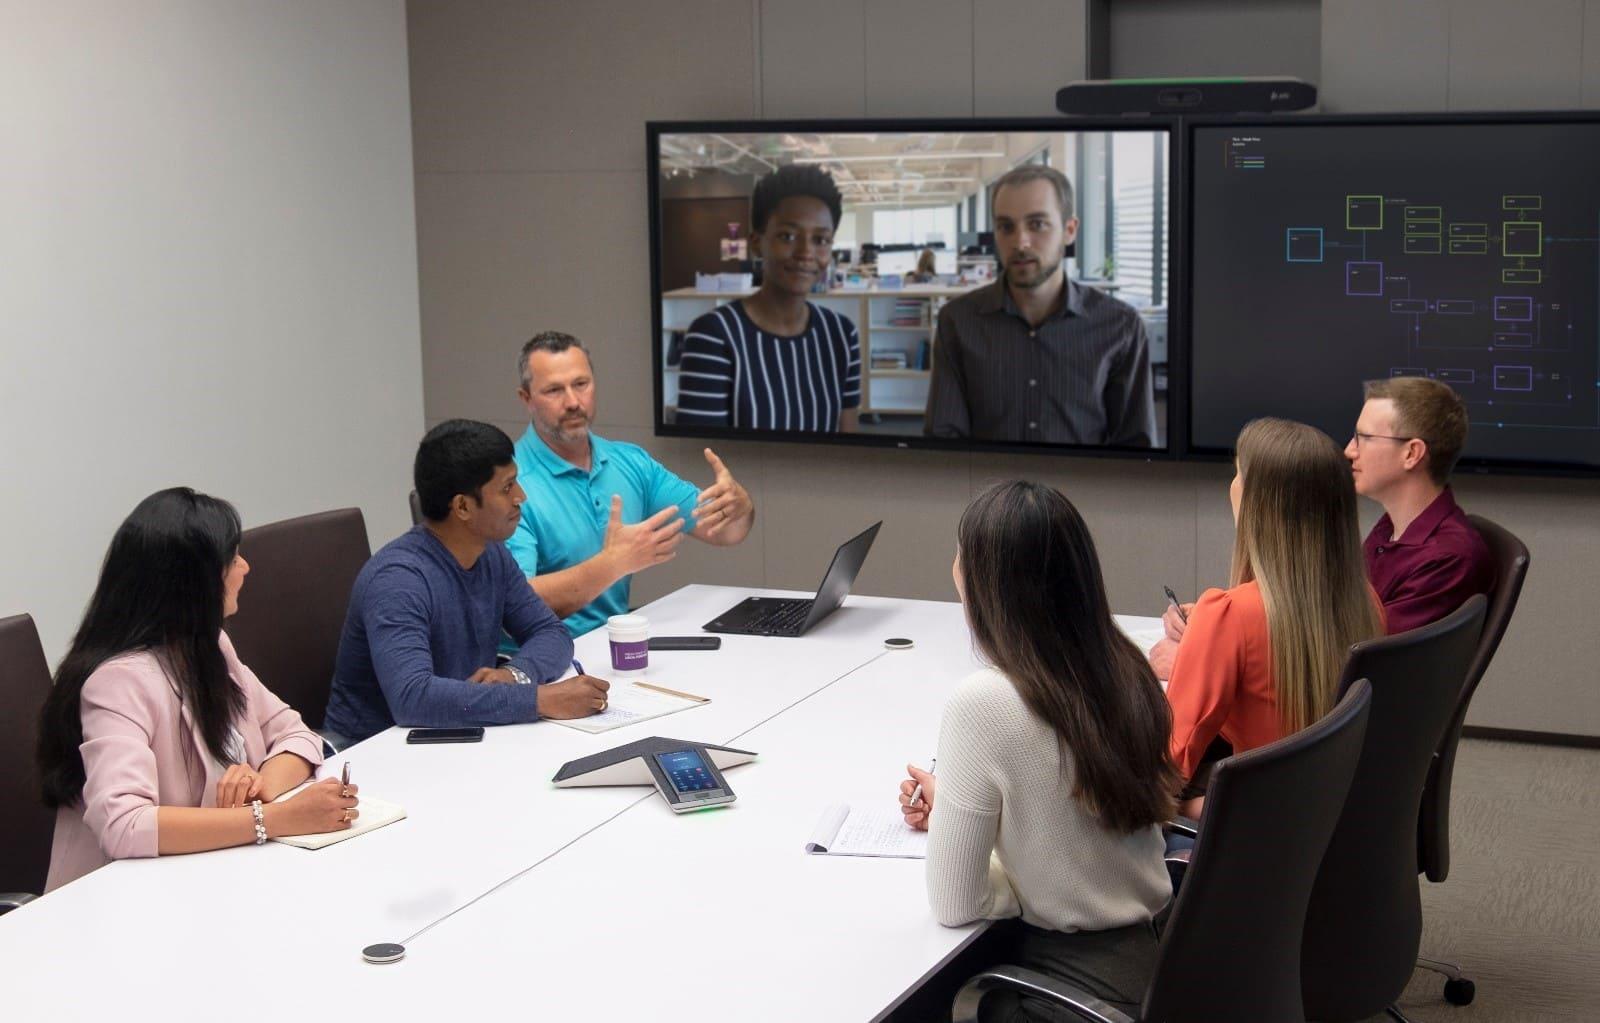 Twenty years of videoconferencing